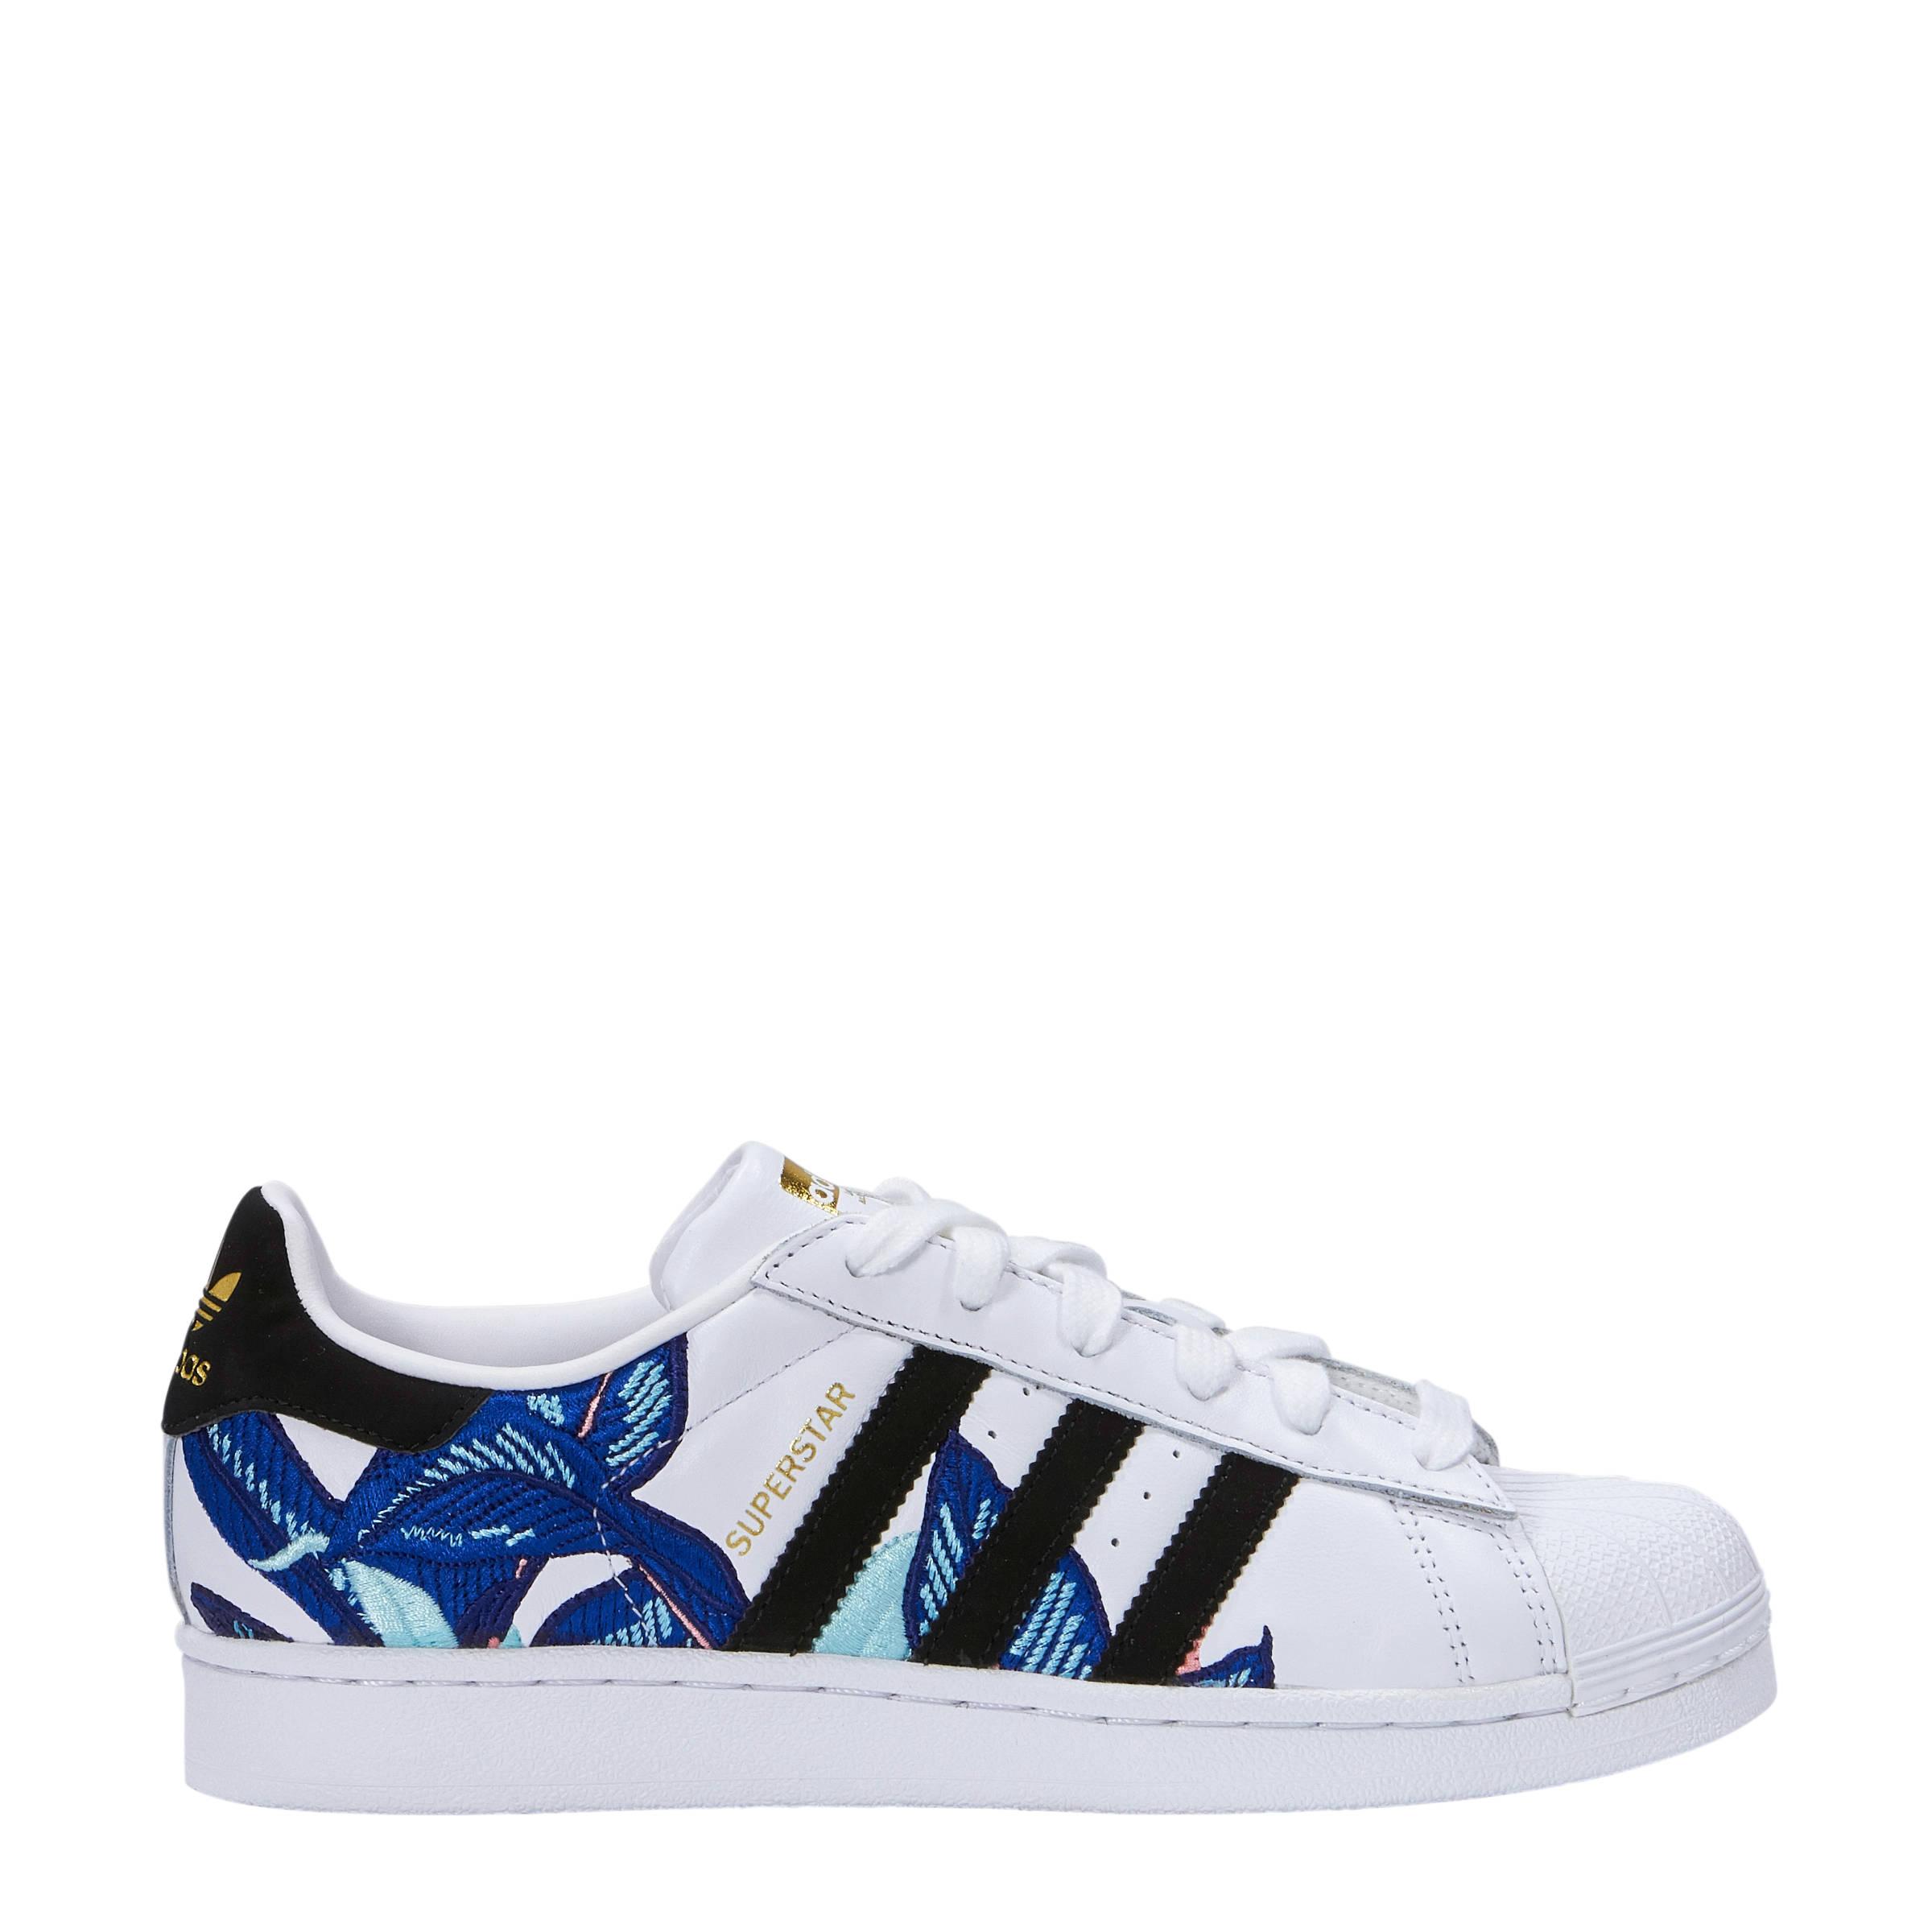 Superstar W sneakers